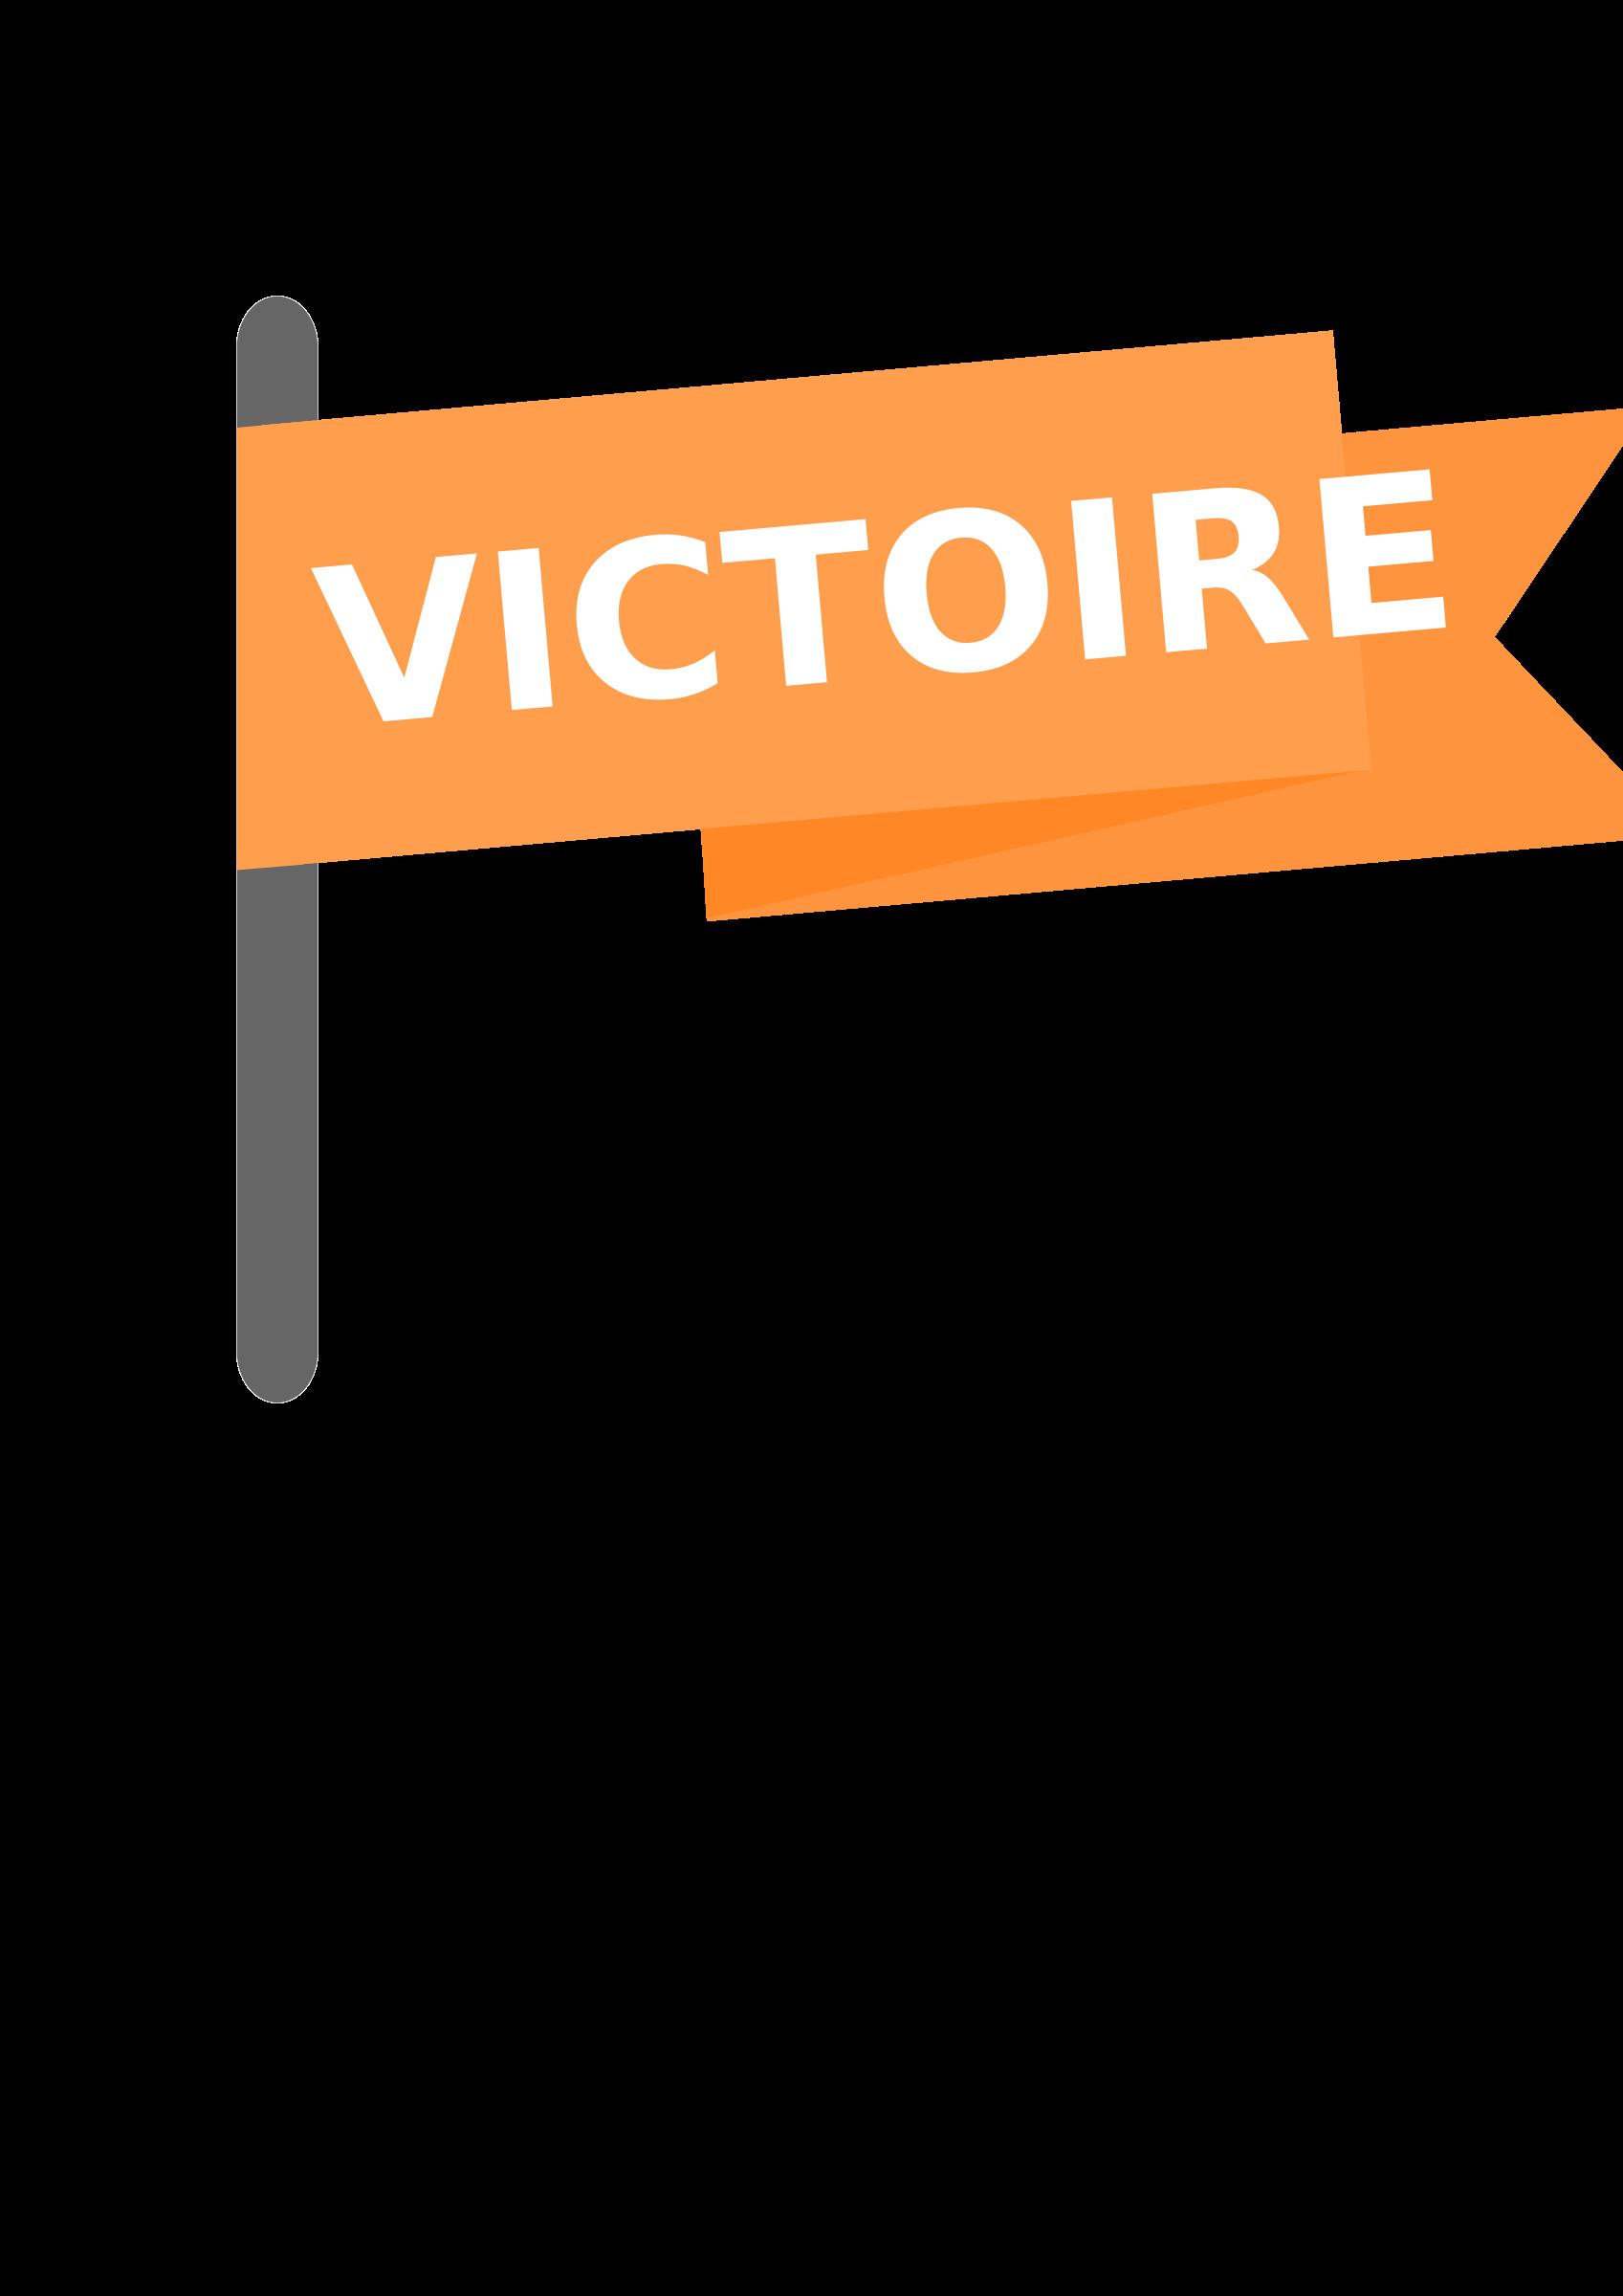 Drapeau victoire victory flag. Win clipart icon